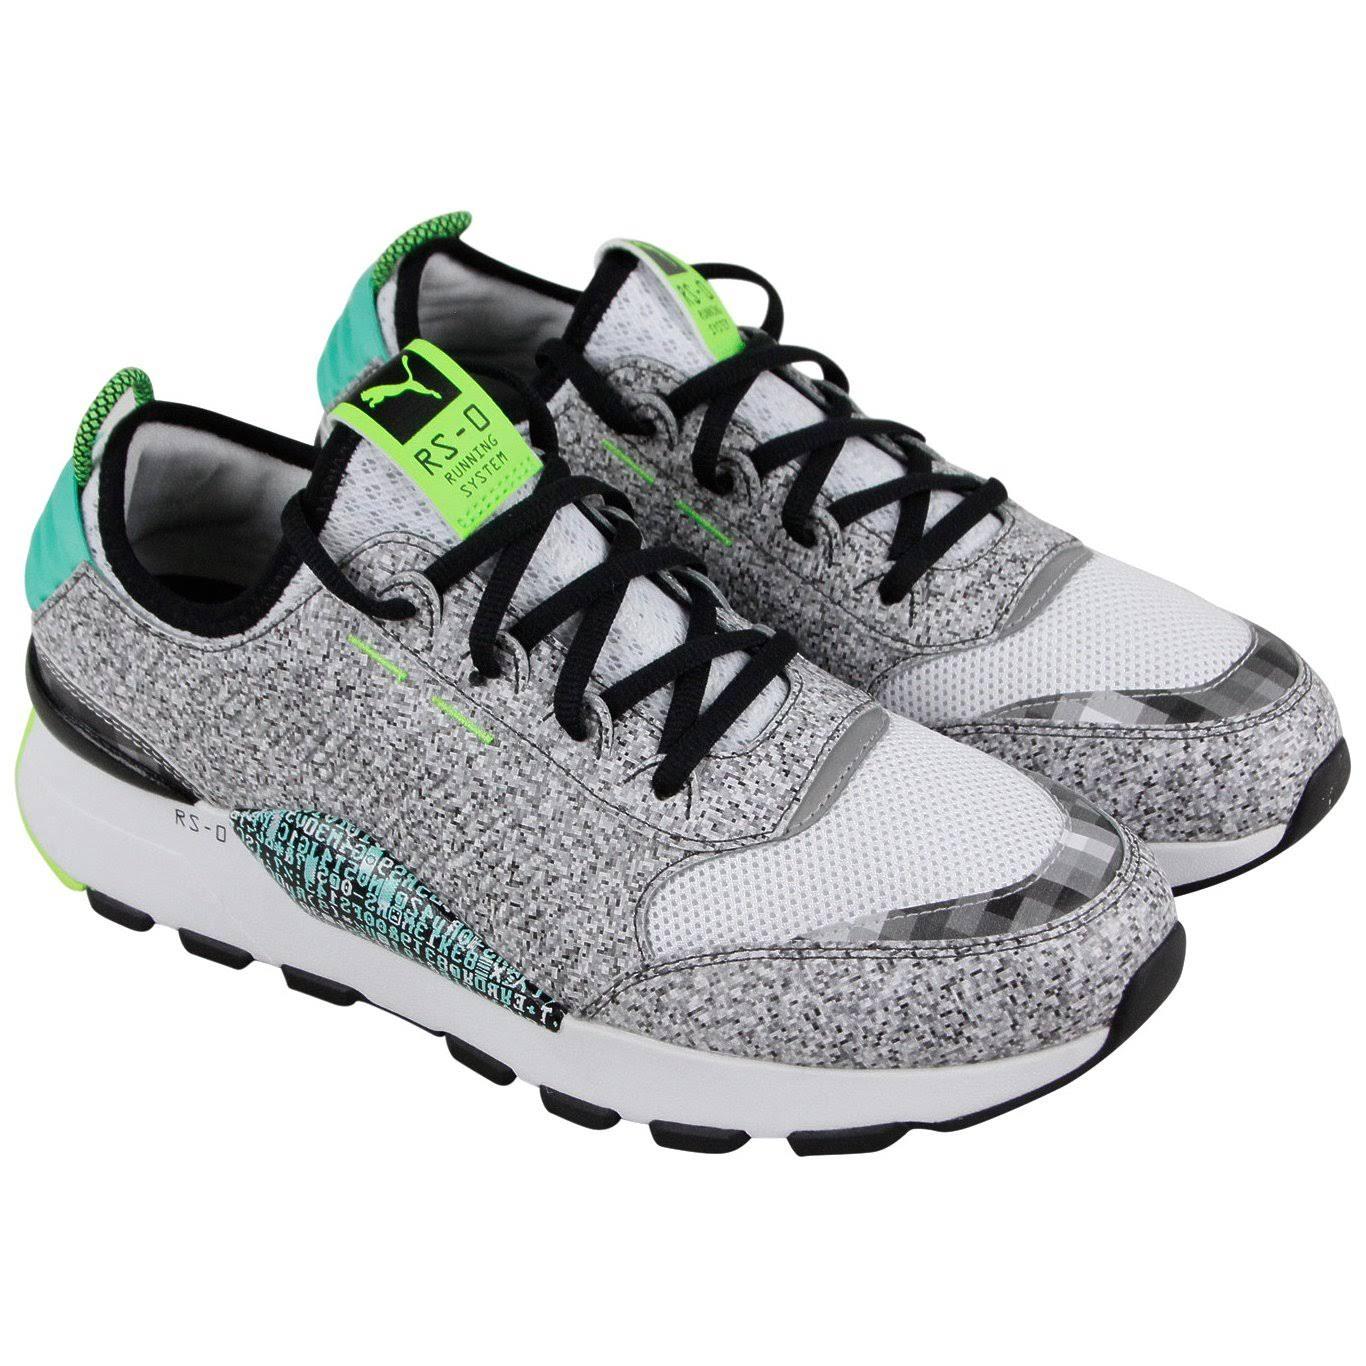 Para 0 Rs Zapatos 36796901 10 Tamaño Hombre Puma tvqOx4wO